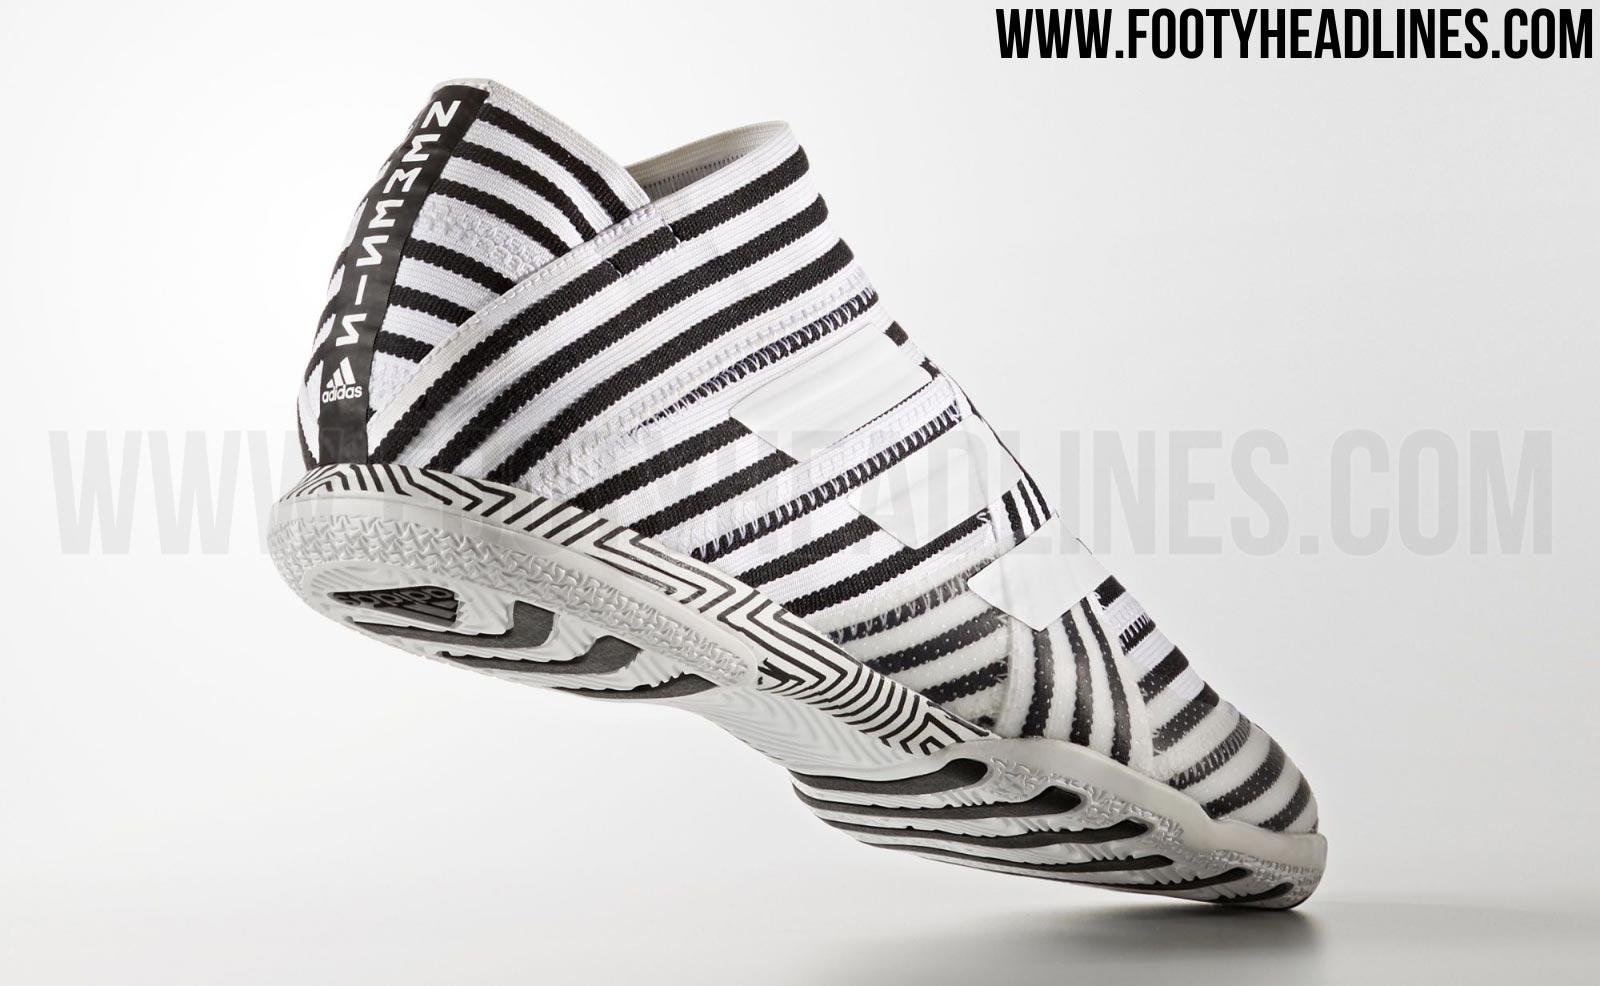 256df4f2418d ... Dust Are you a fan of the Adidas Nemeziz Tango 17+ 360Agility Comment  below, ...